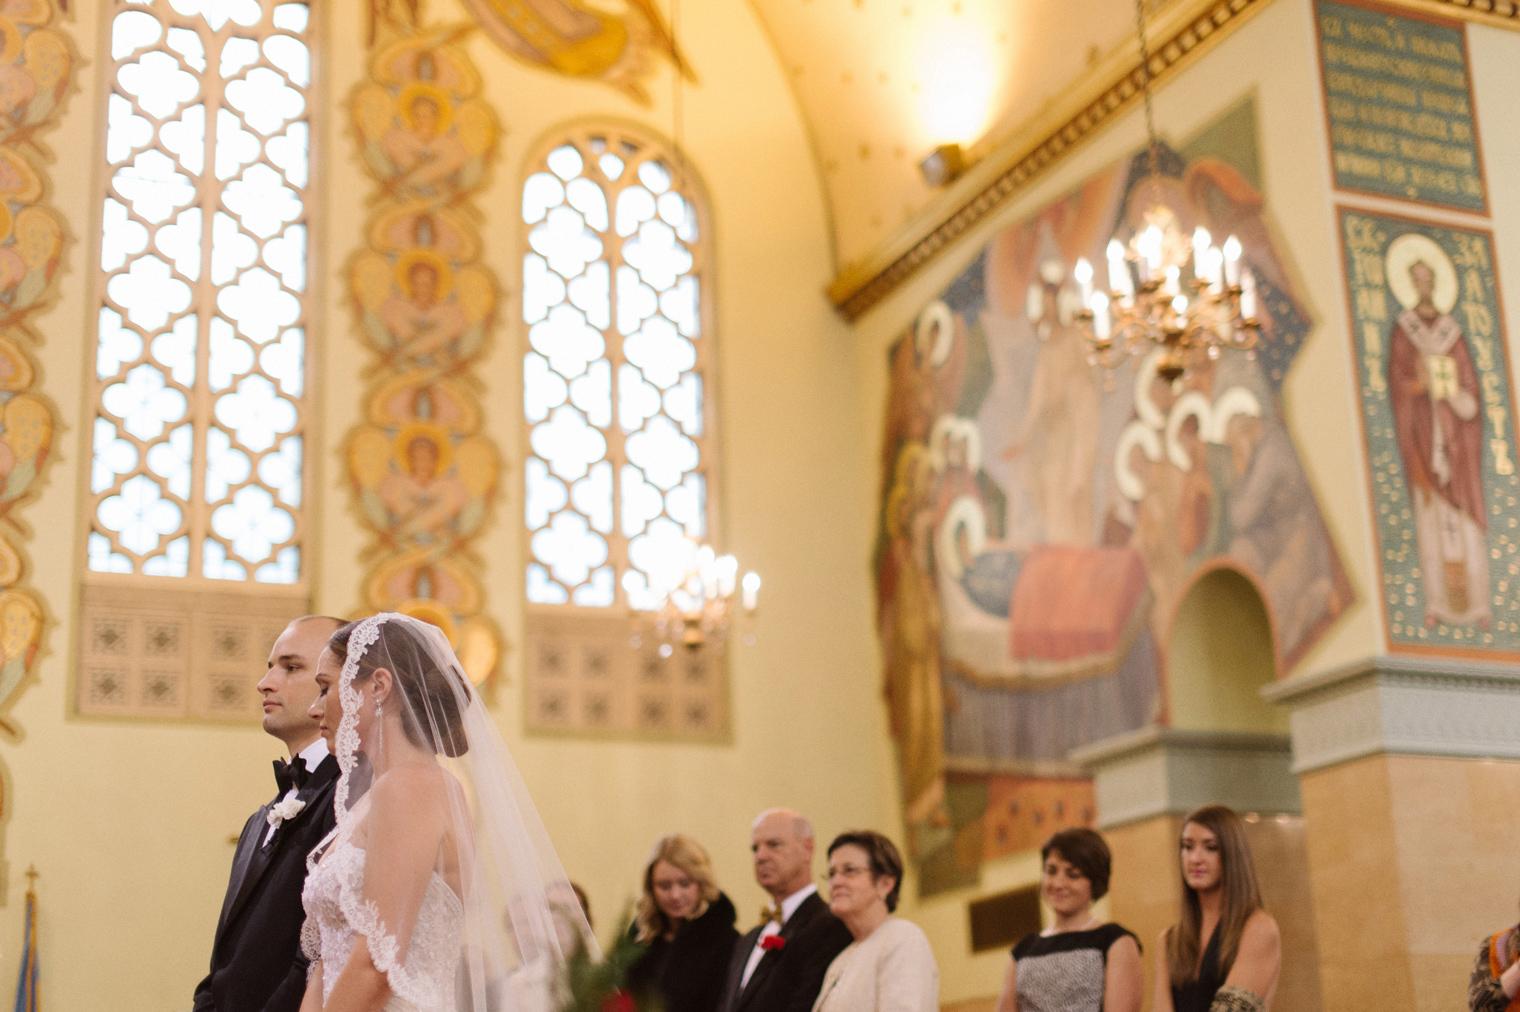 Ukrainian Orthodox Wedding Ceremony in Hamtramck Michigan by photographer Heather Jowett.